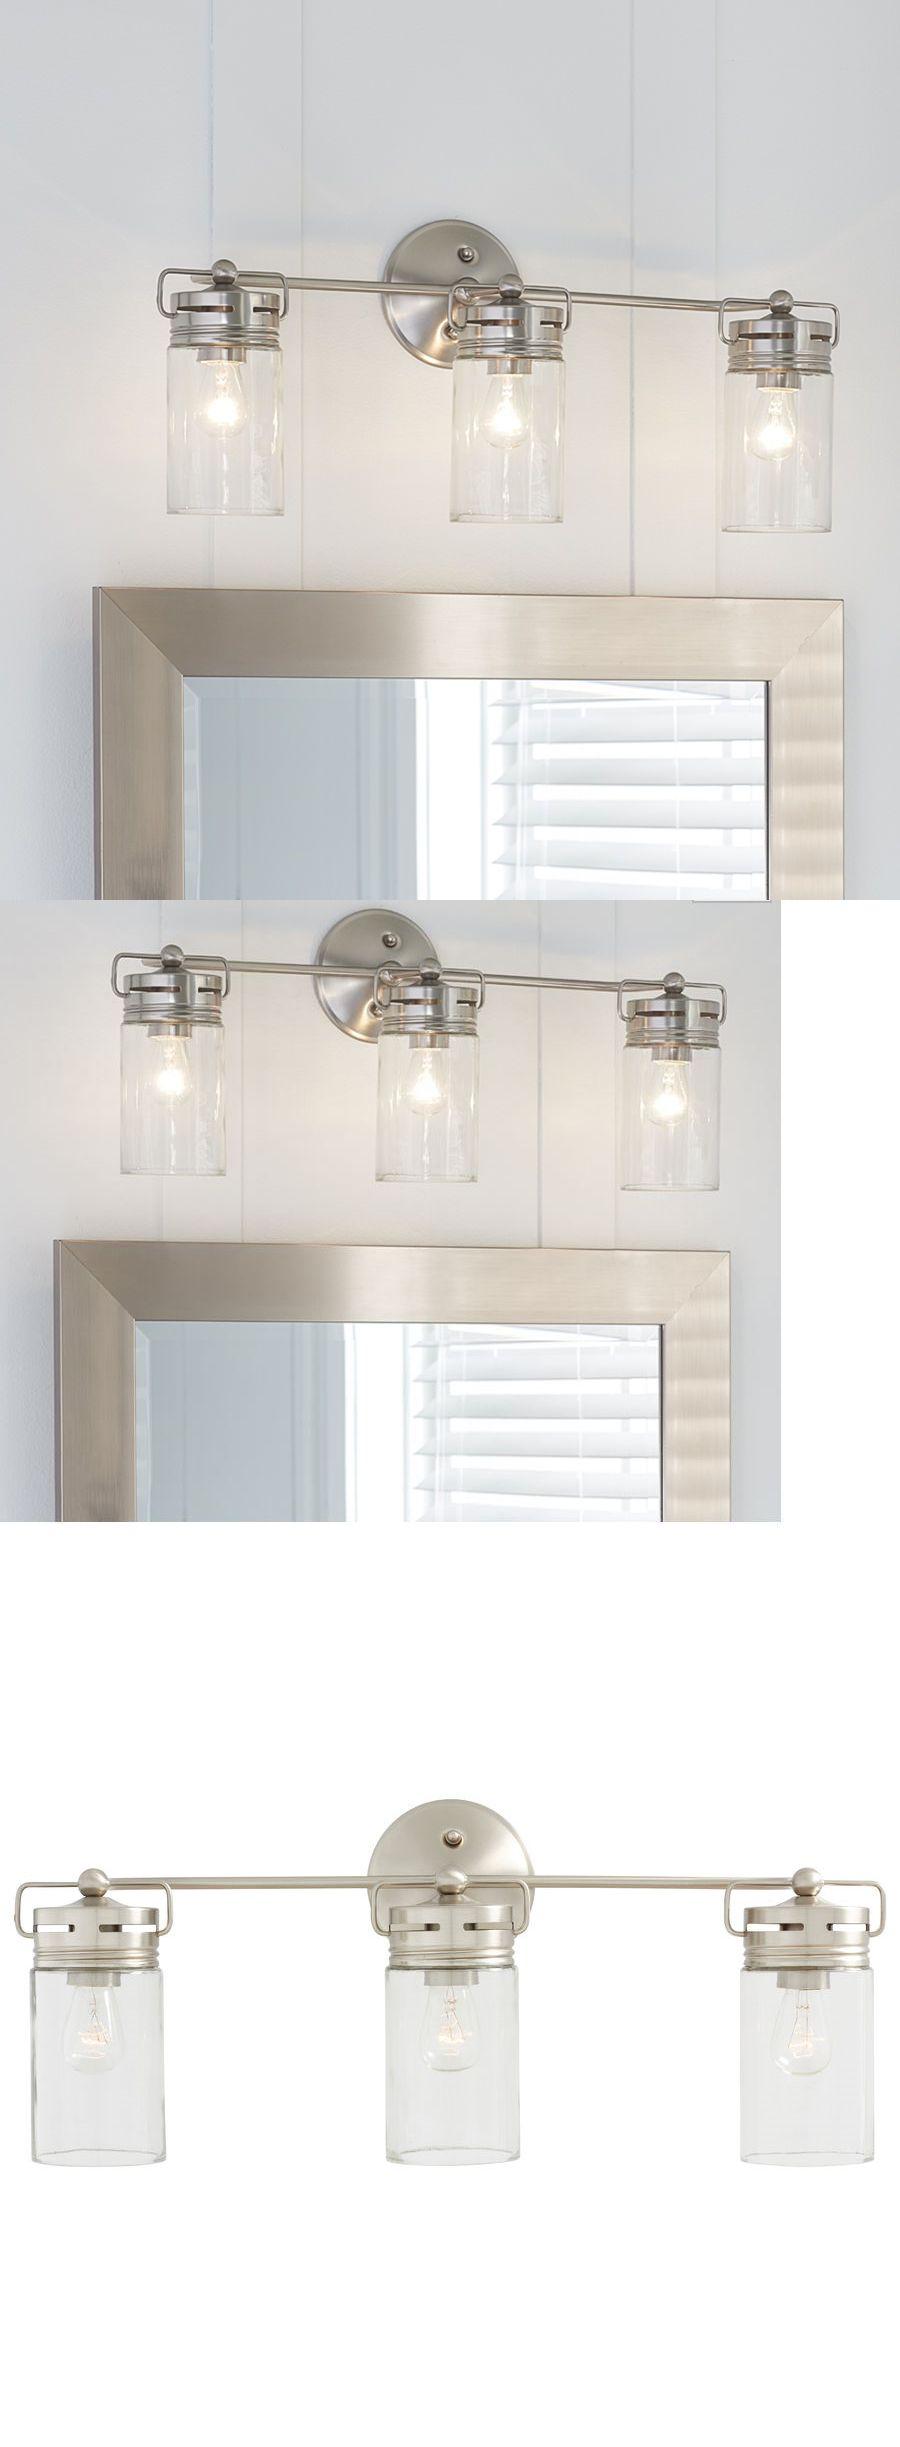 Bathroom Lighting Fixtures On Ebay wall fixtures 116880: allen + roth vanity light bathroom lighting